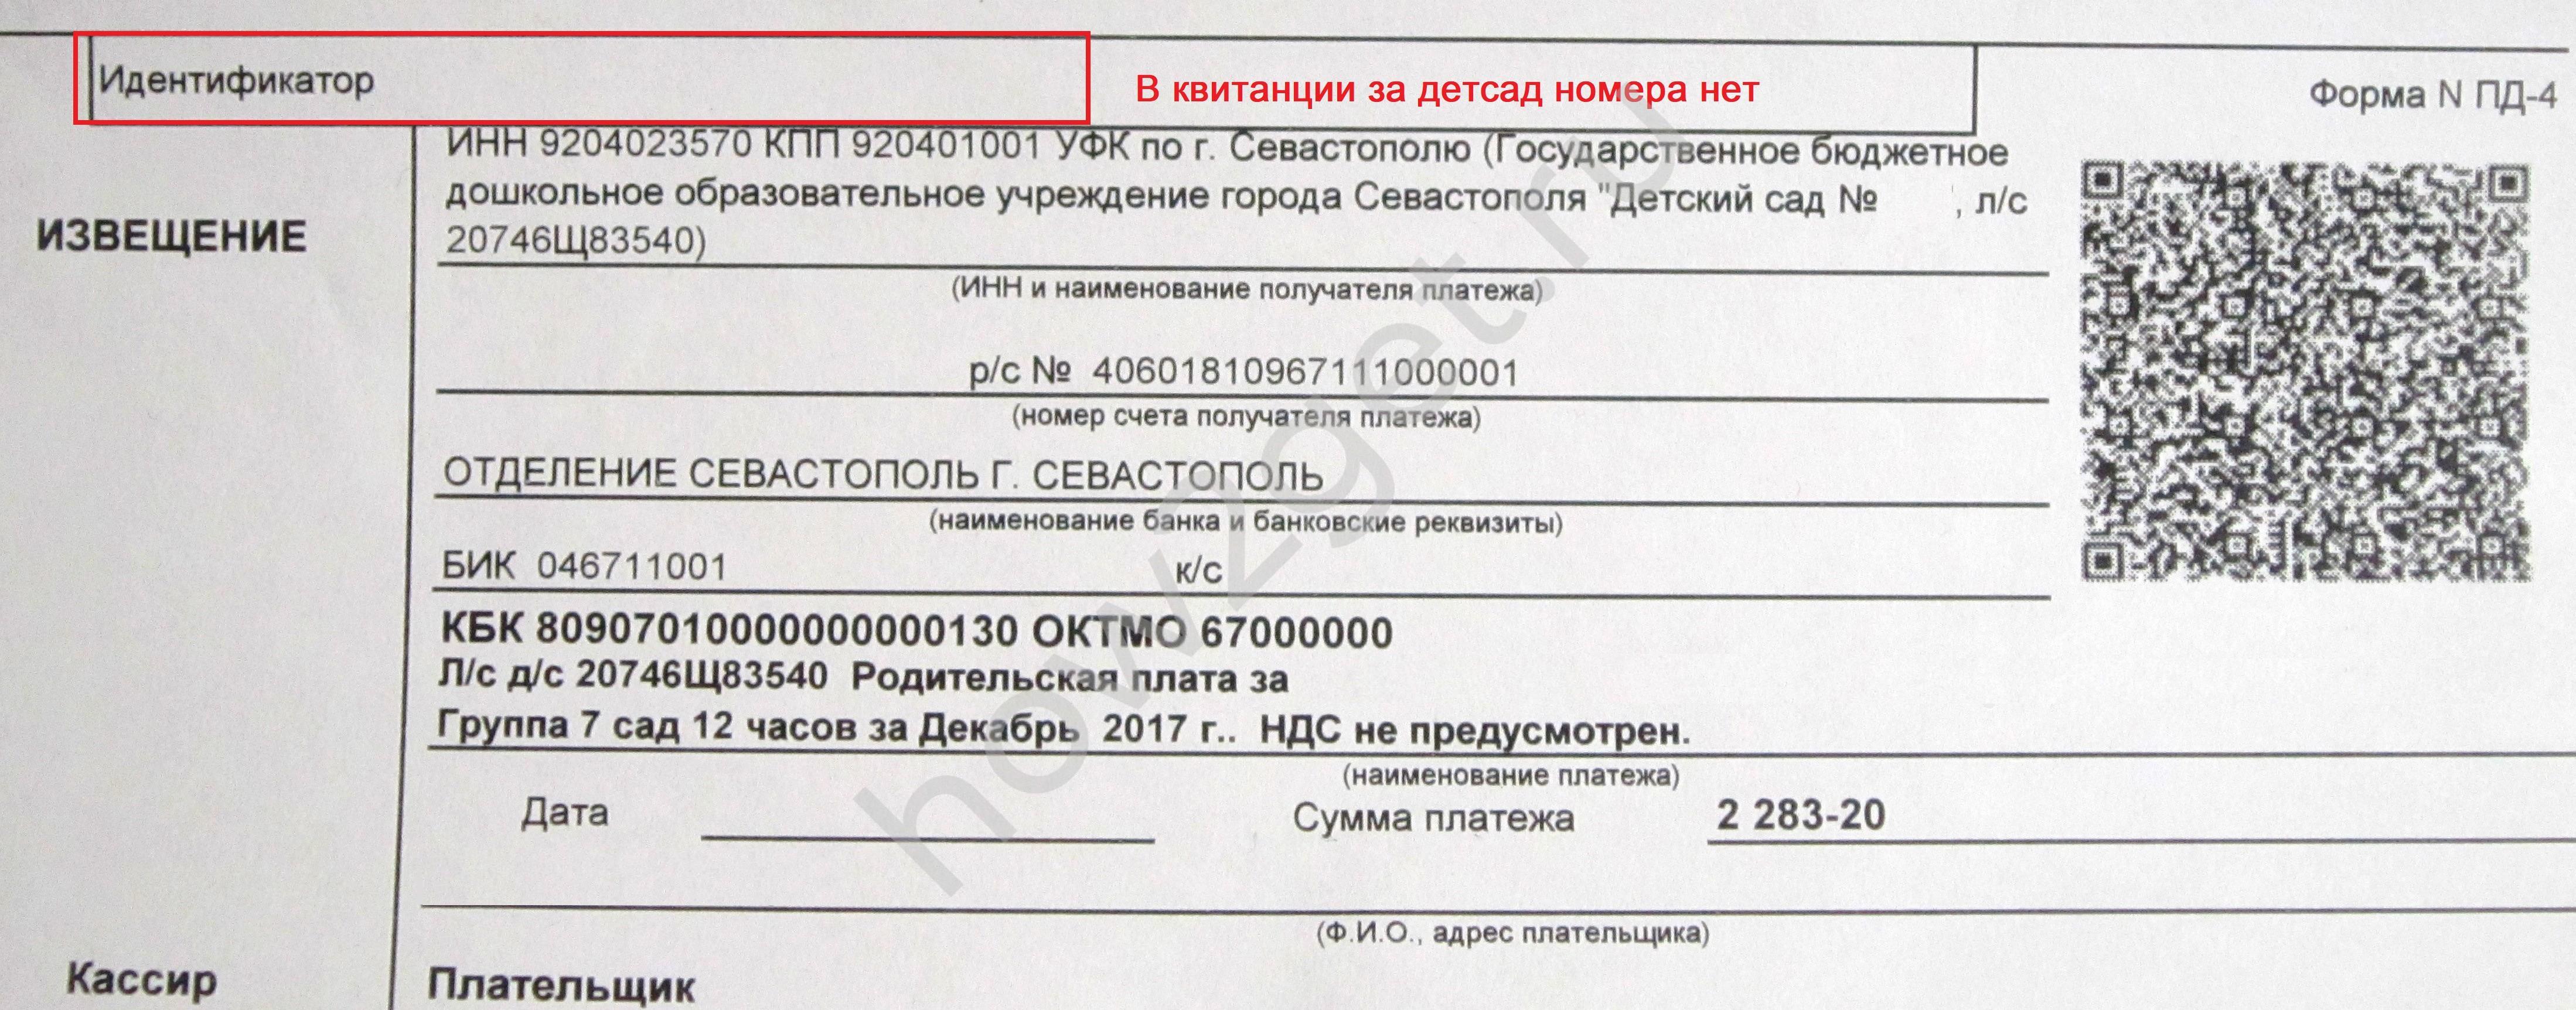 img-7834